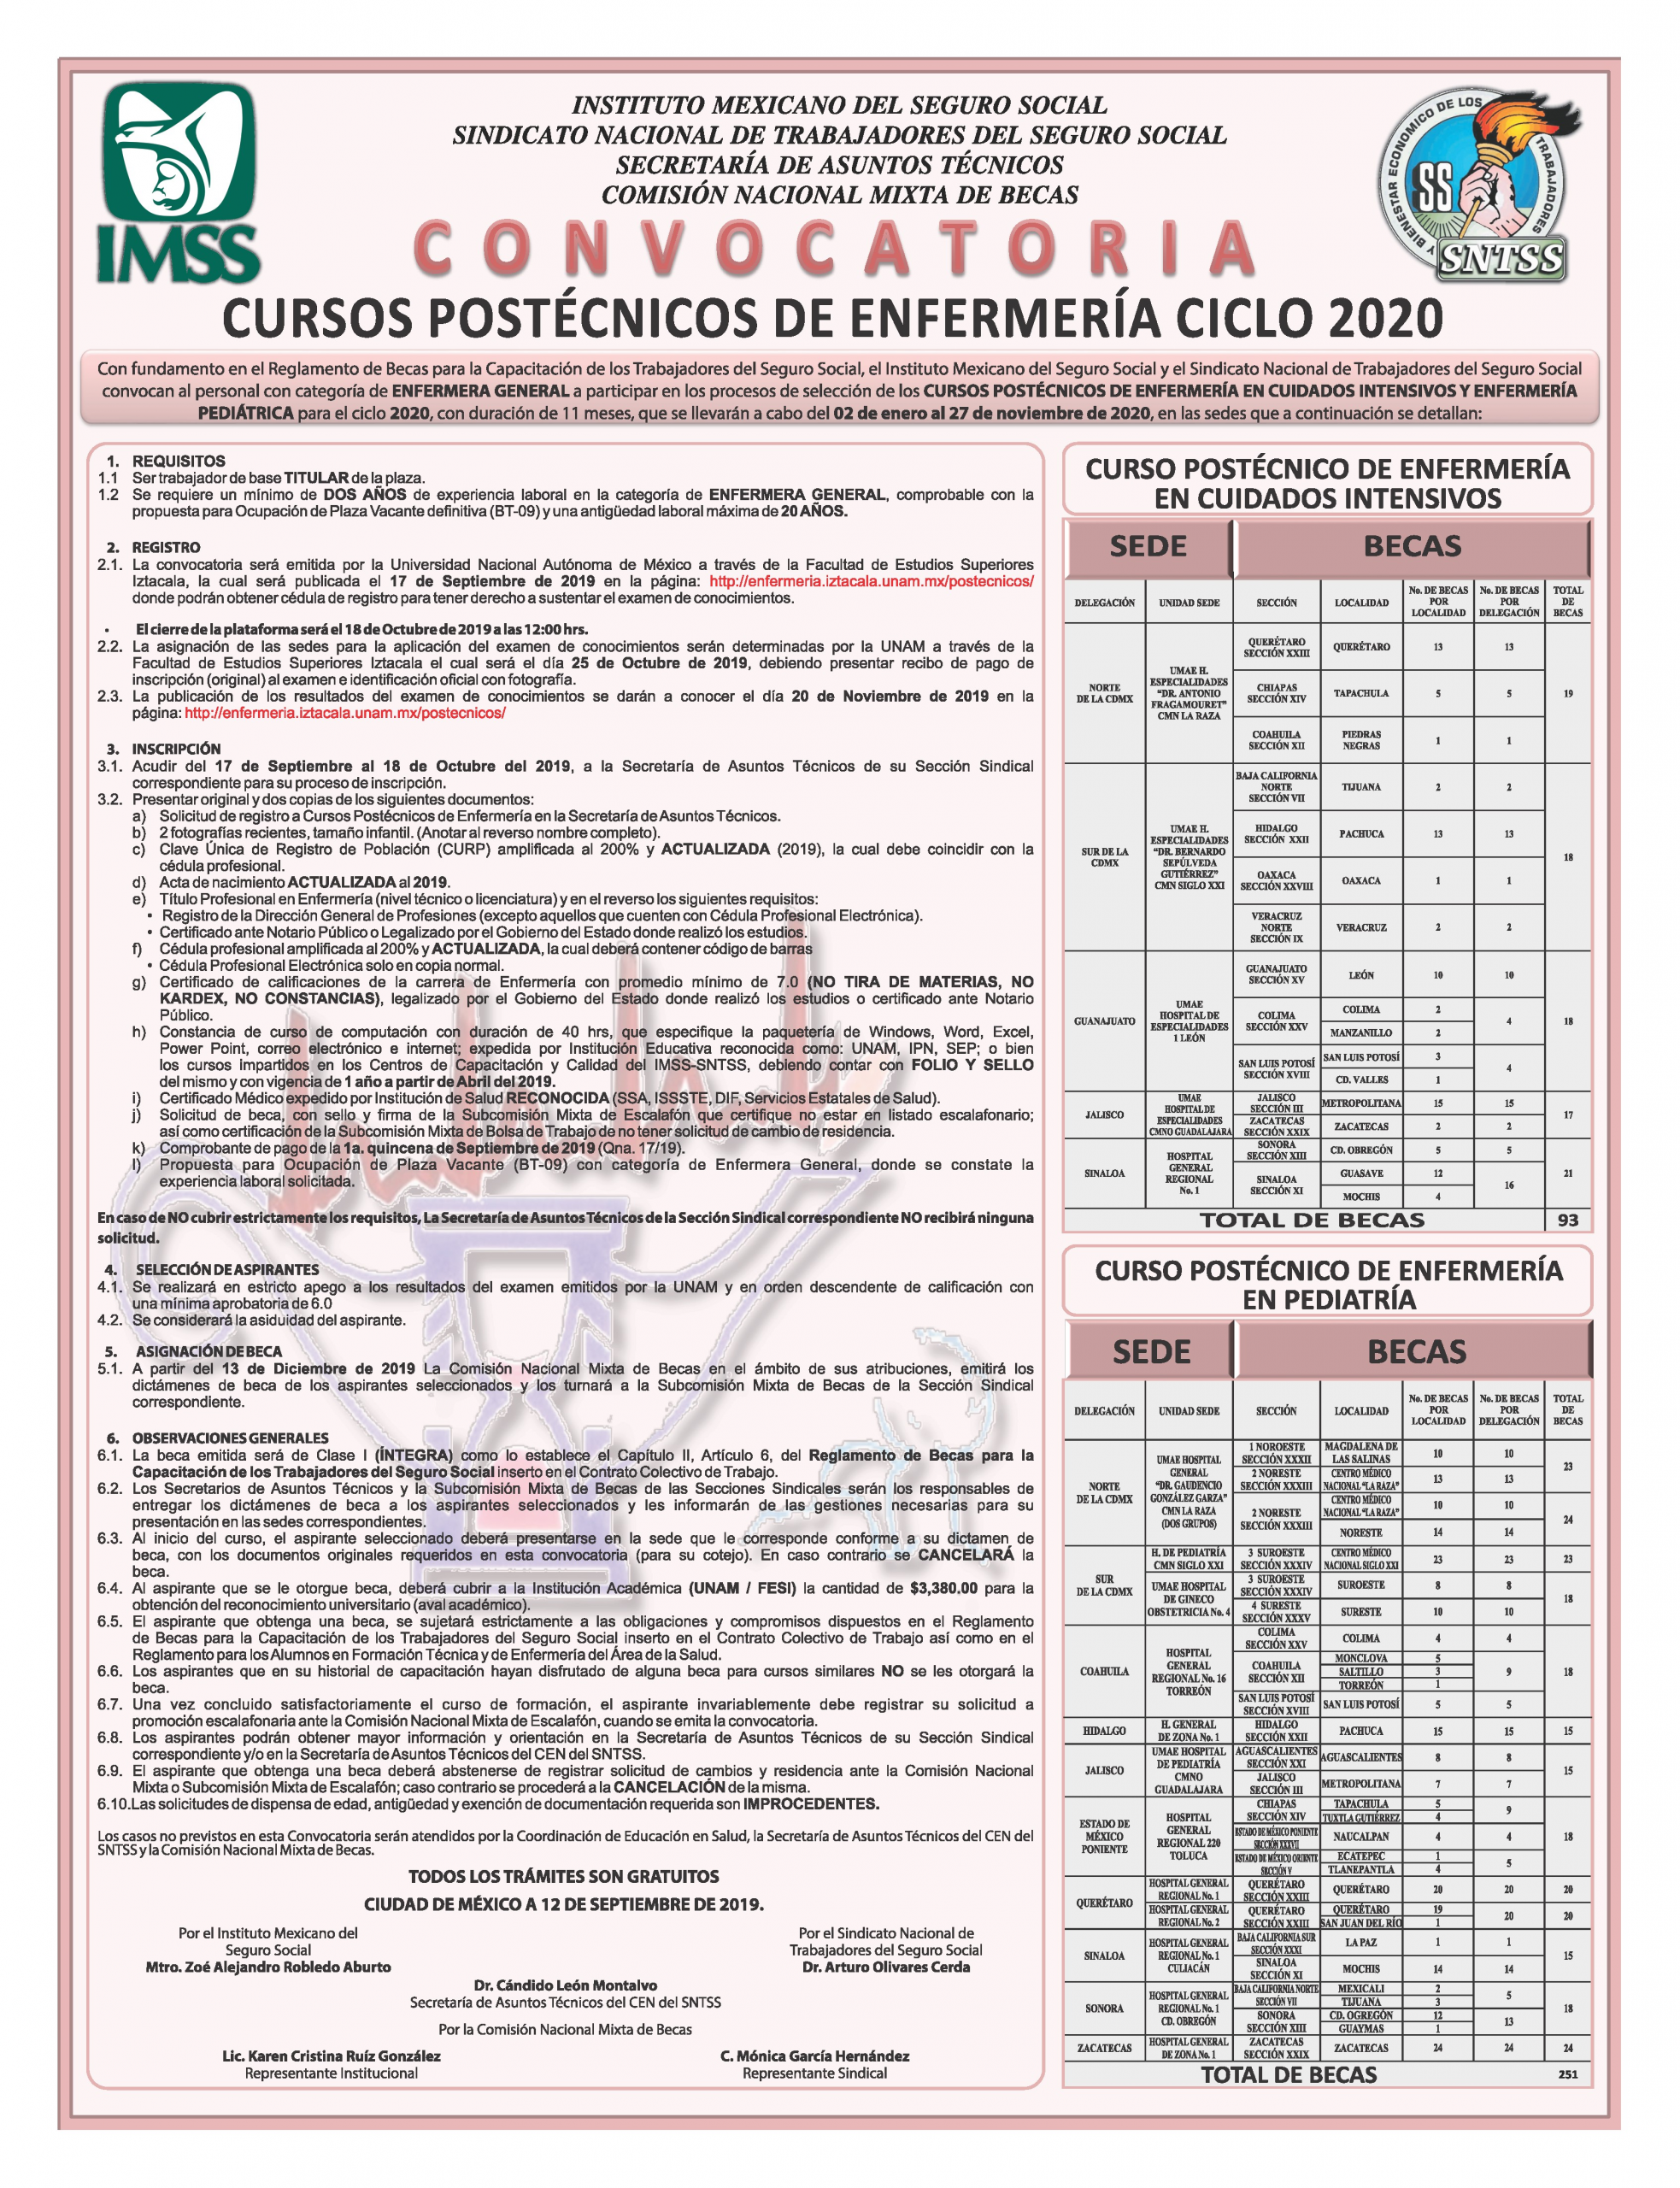 convocatoria curso postecnicos de enfermeria ciclo 2020 f25l image